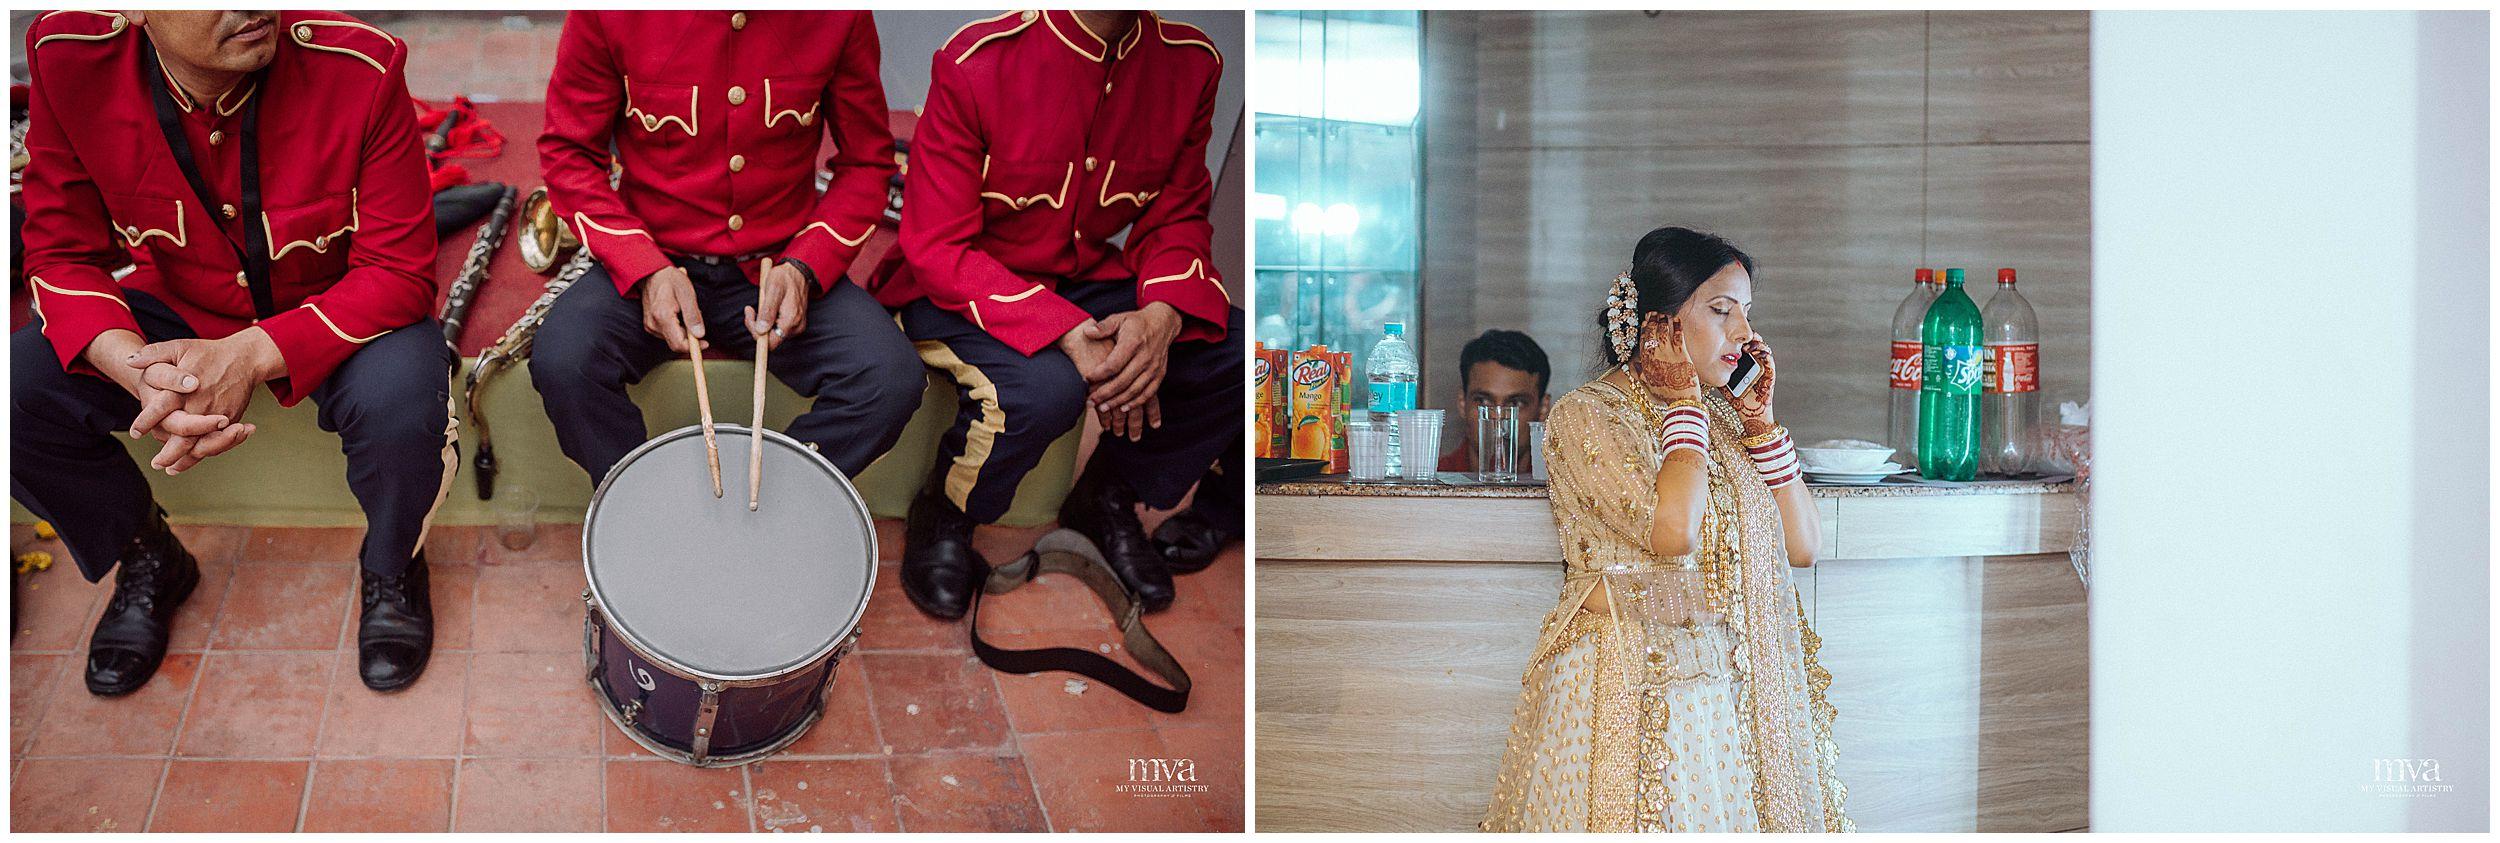 SONAAL_AMI_MYVISUALARTISTRY_WEDDING_PHOTOGRAPHY_MVA_NEPAL_KATHMANDU_SOALTEE32.jpg